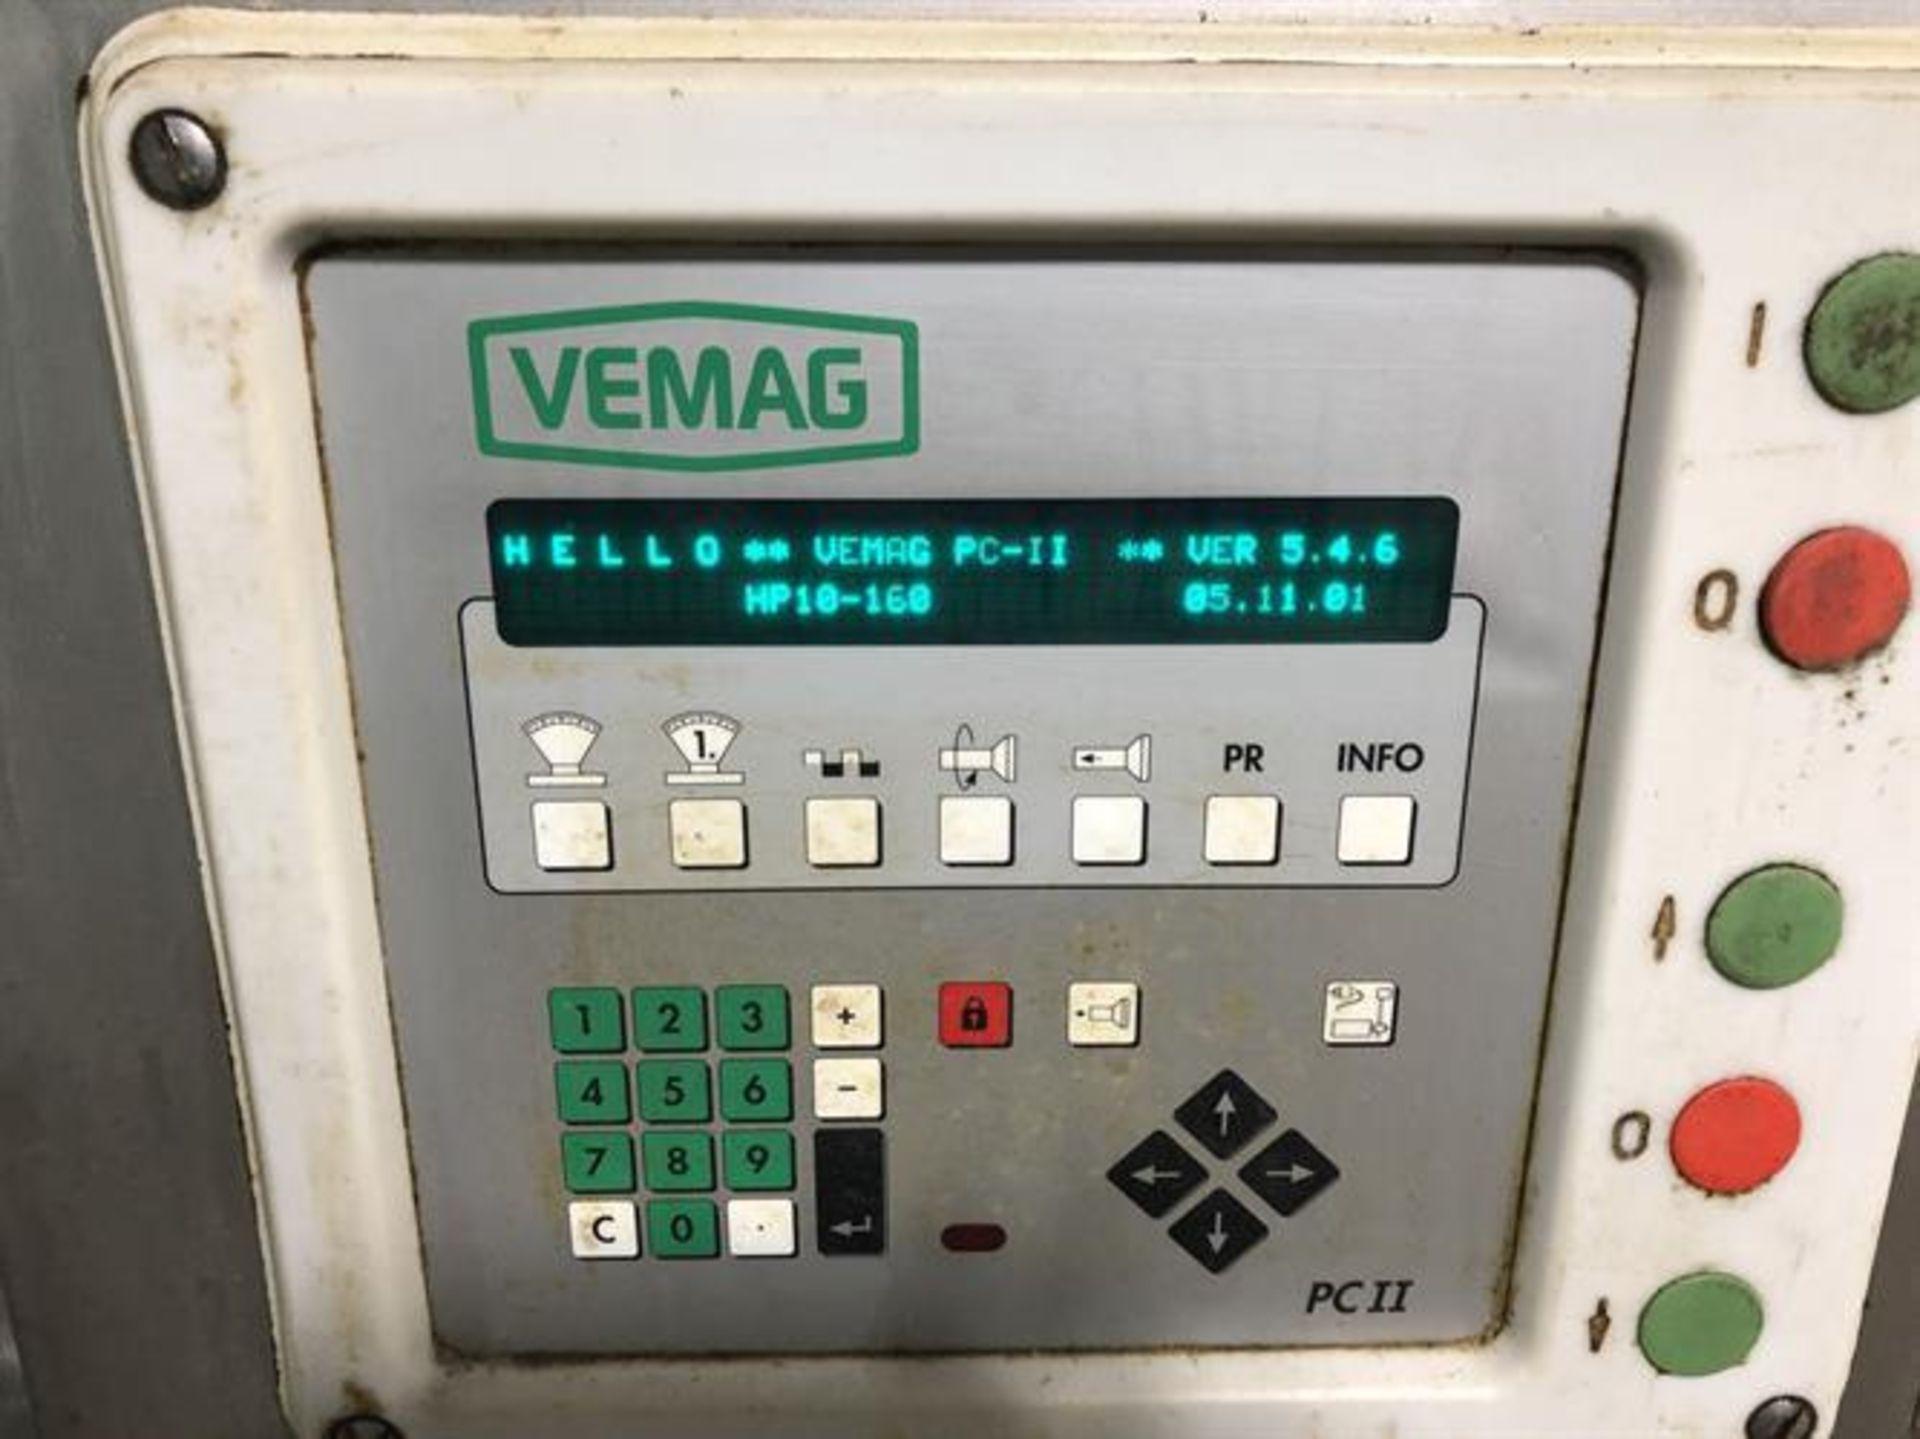 Vemag model HP10C Extruder - Portion controls - Image 5 of 10